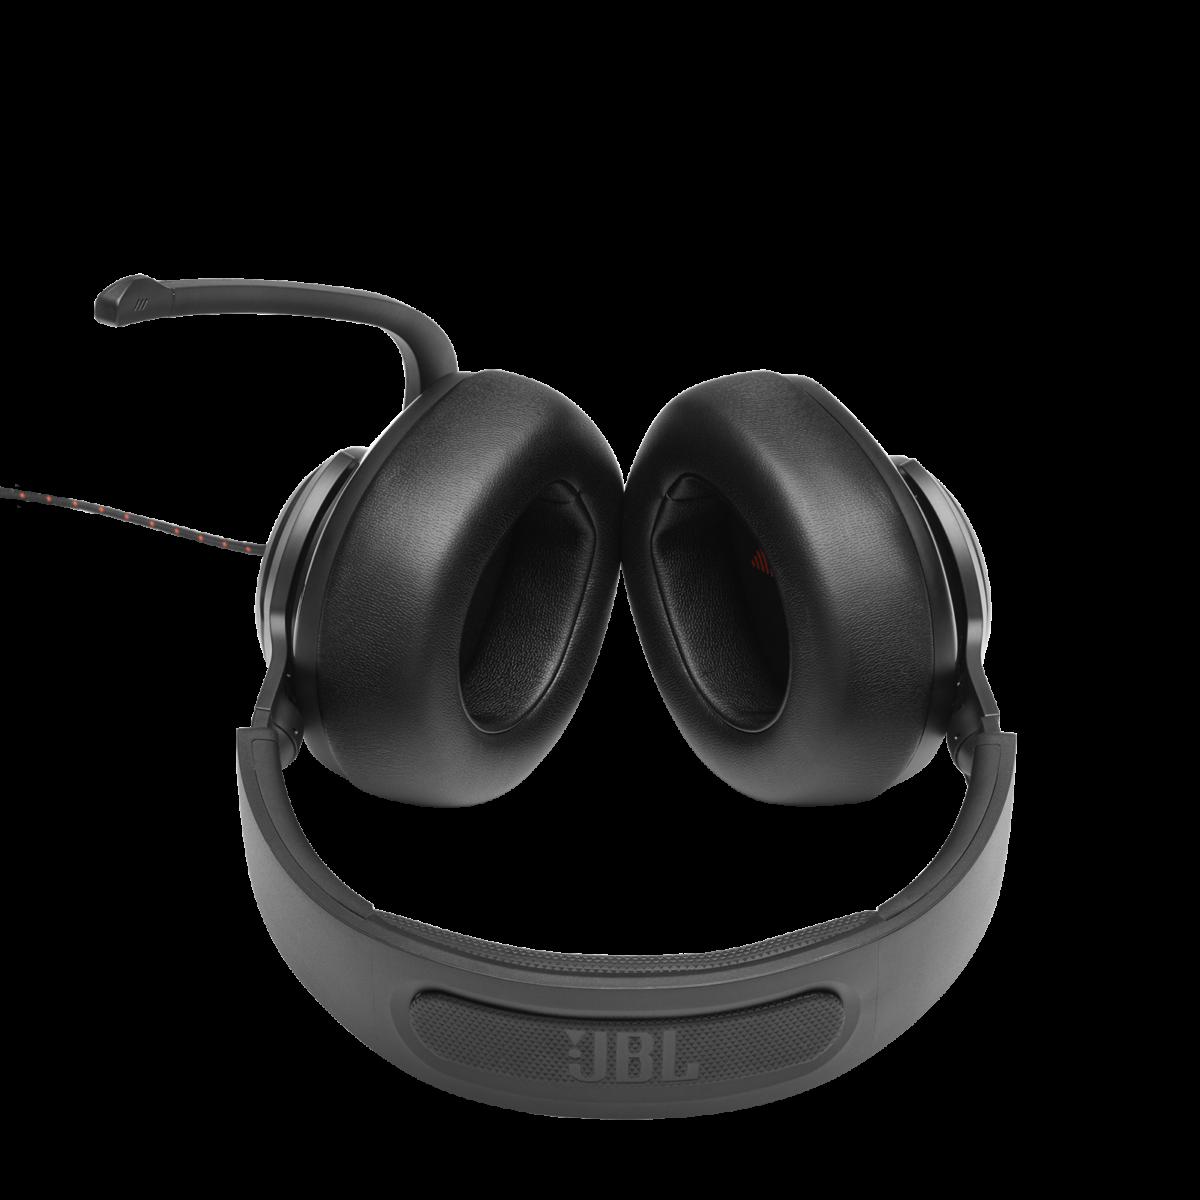 JBL Quantum 300 Product Image headband